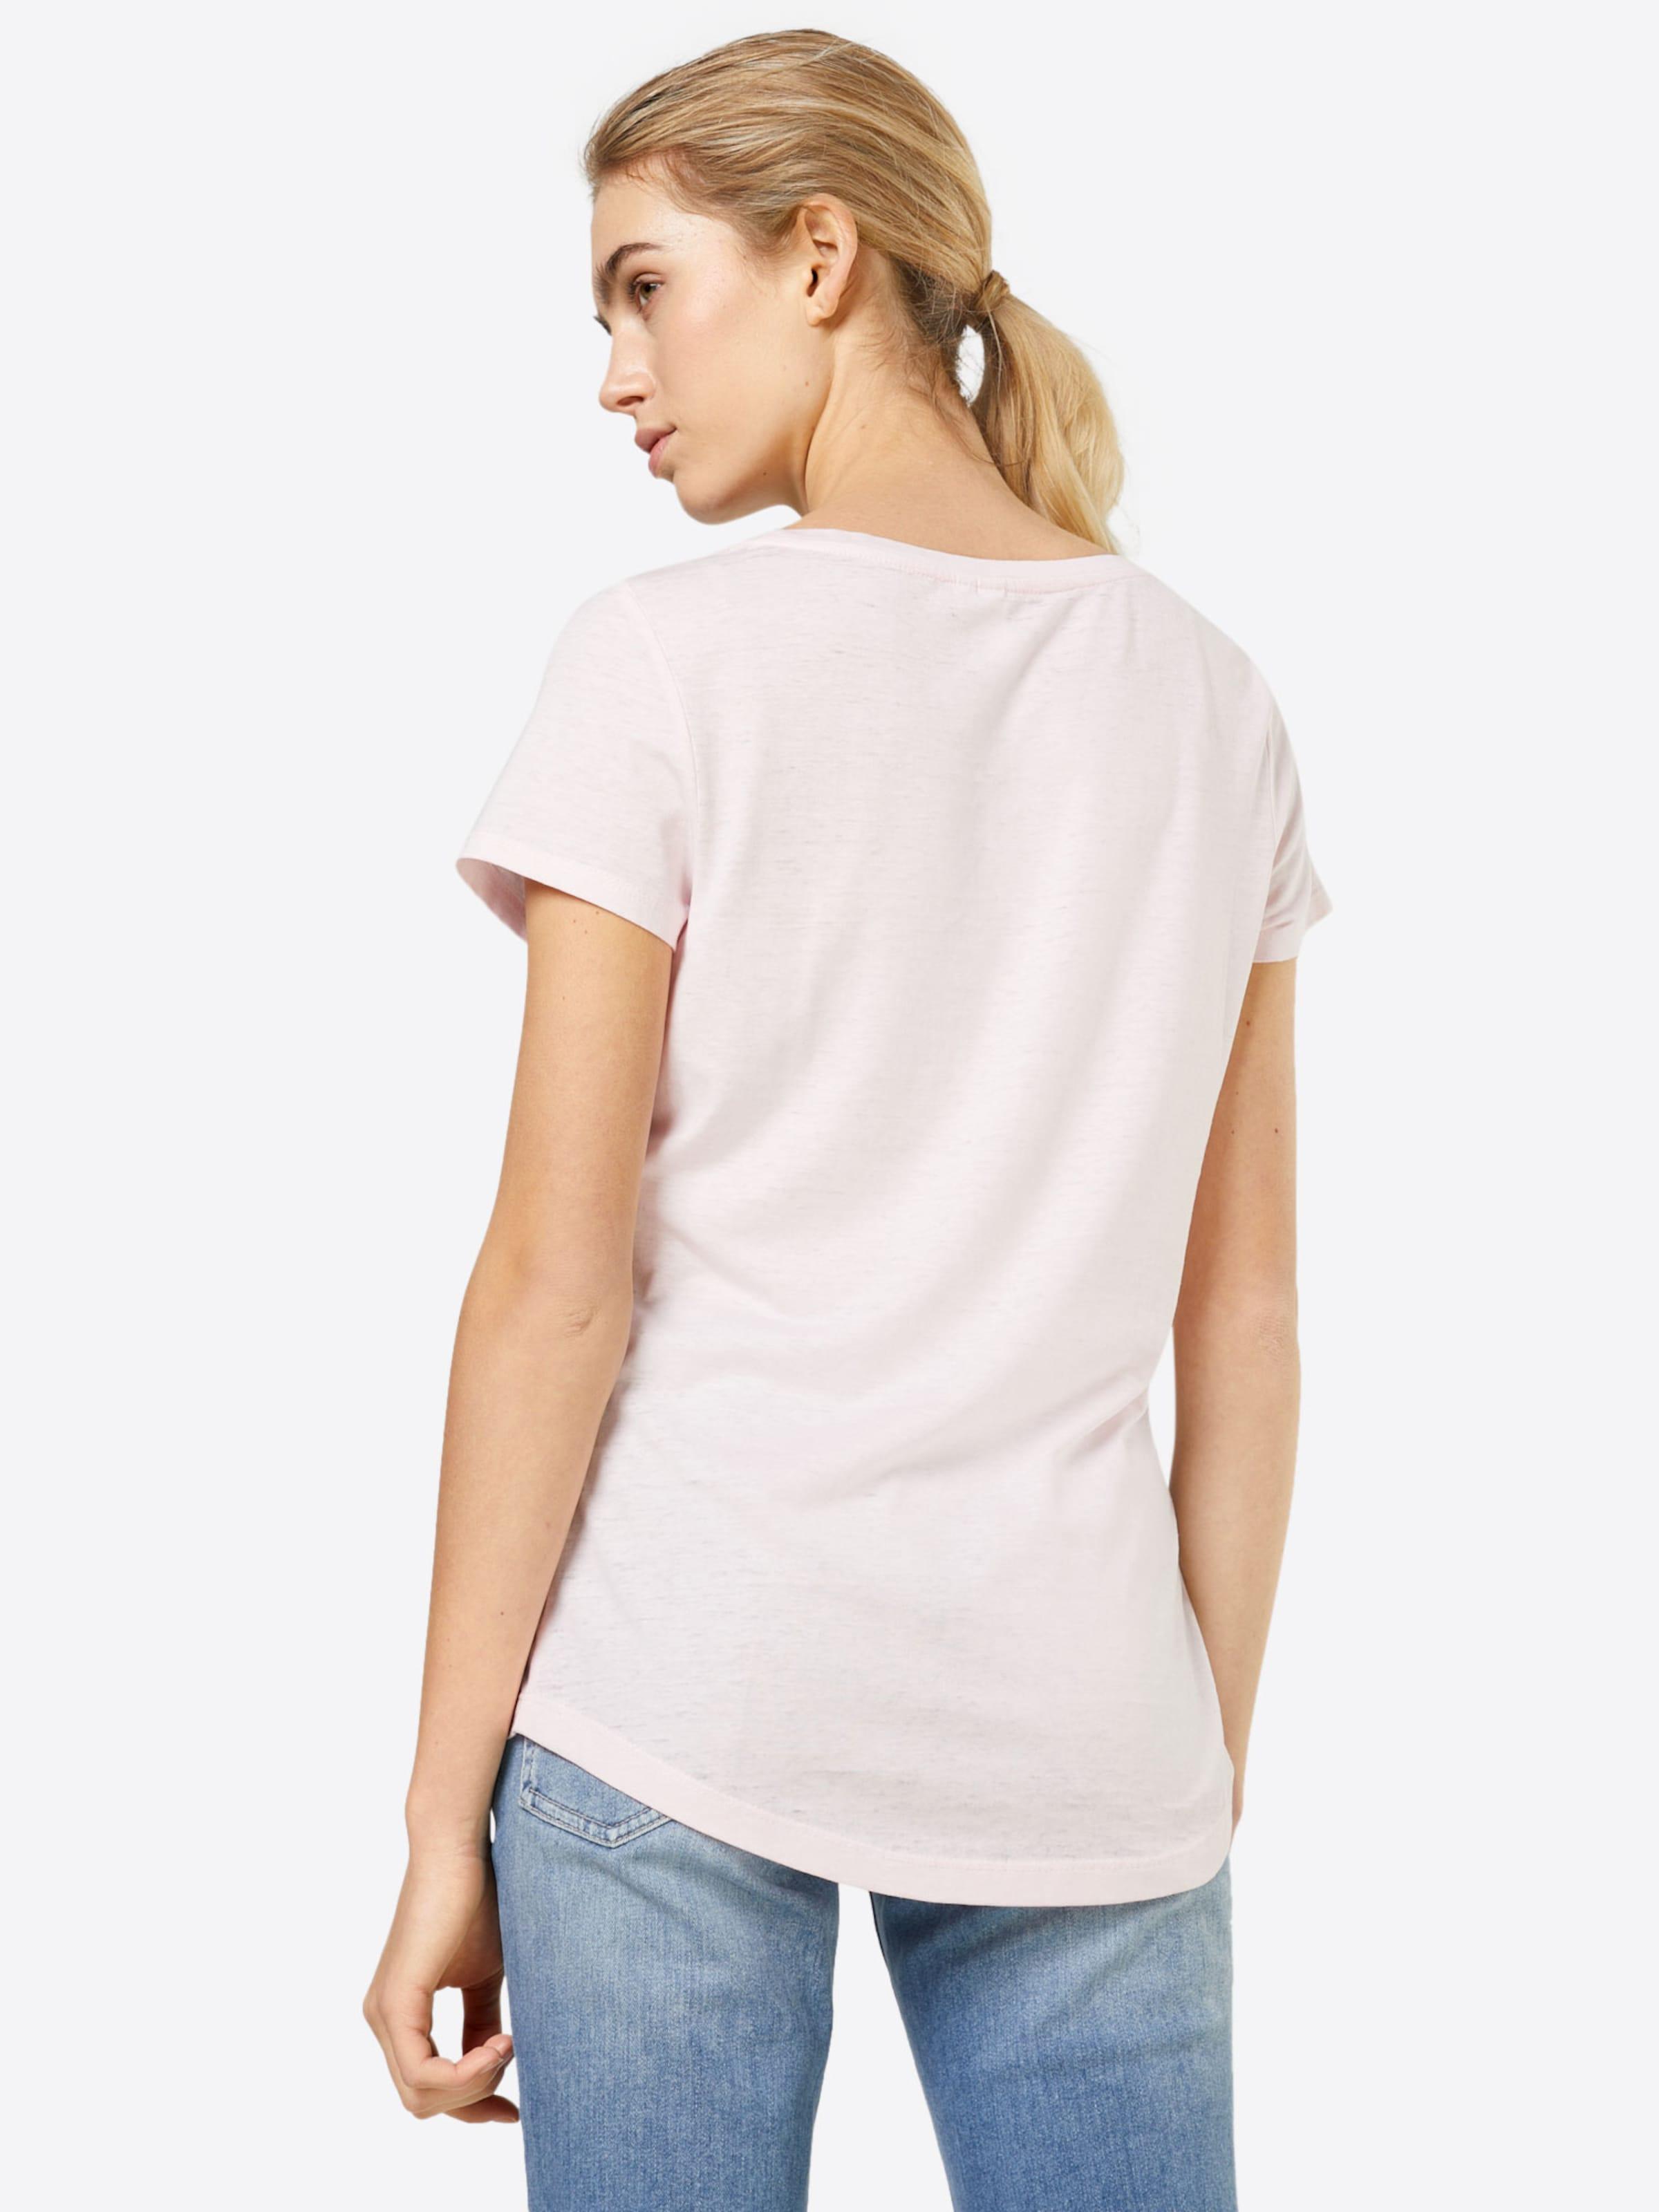 Niedrigere Preise Neueste s.Oliver Denim T-Shirt mit Print Drop-Shipping uDhUp